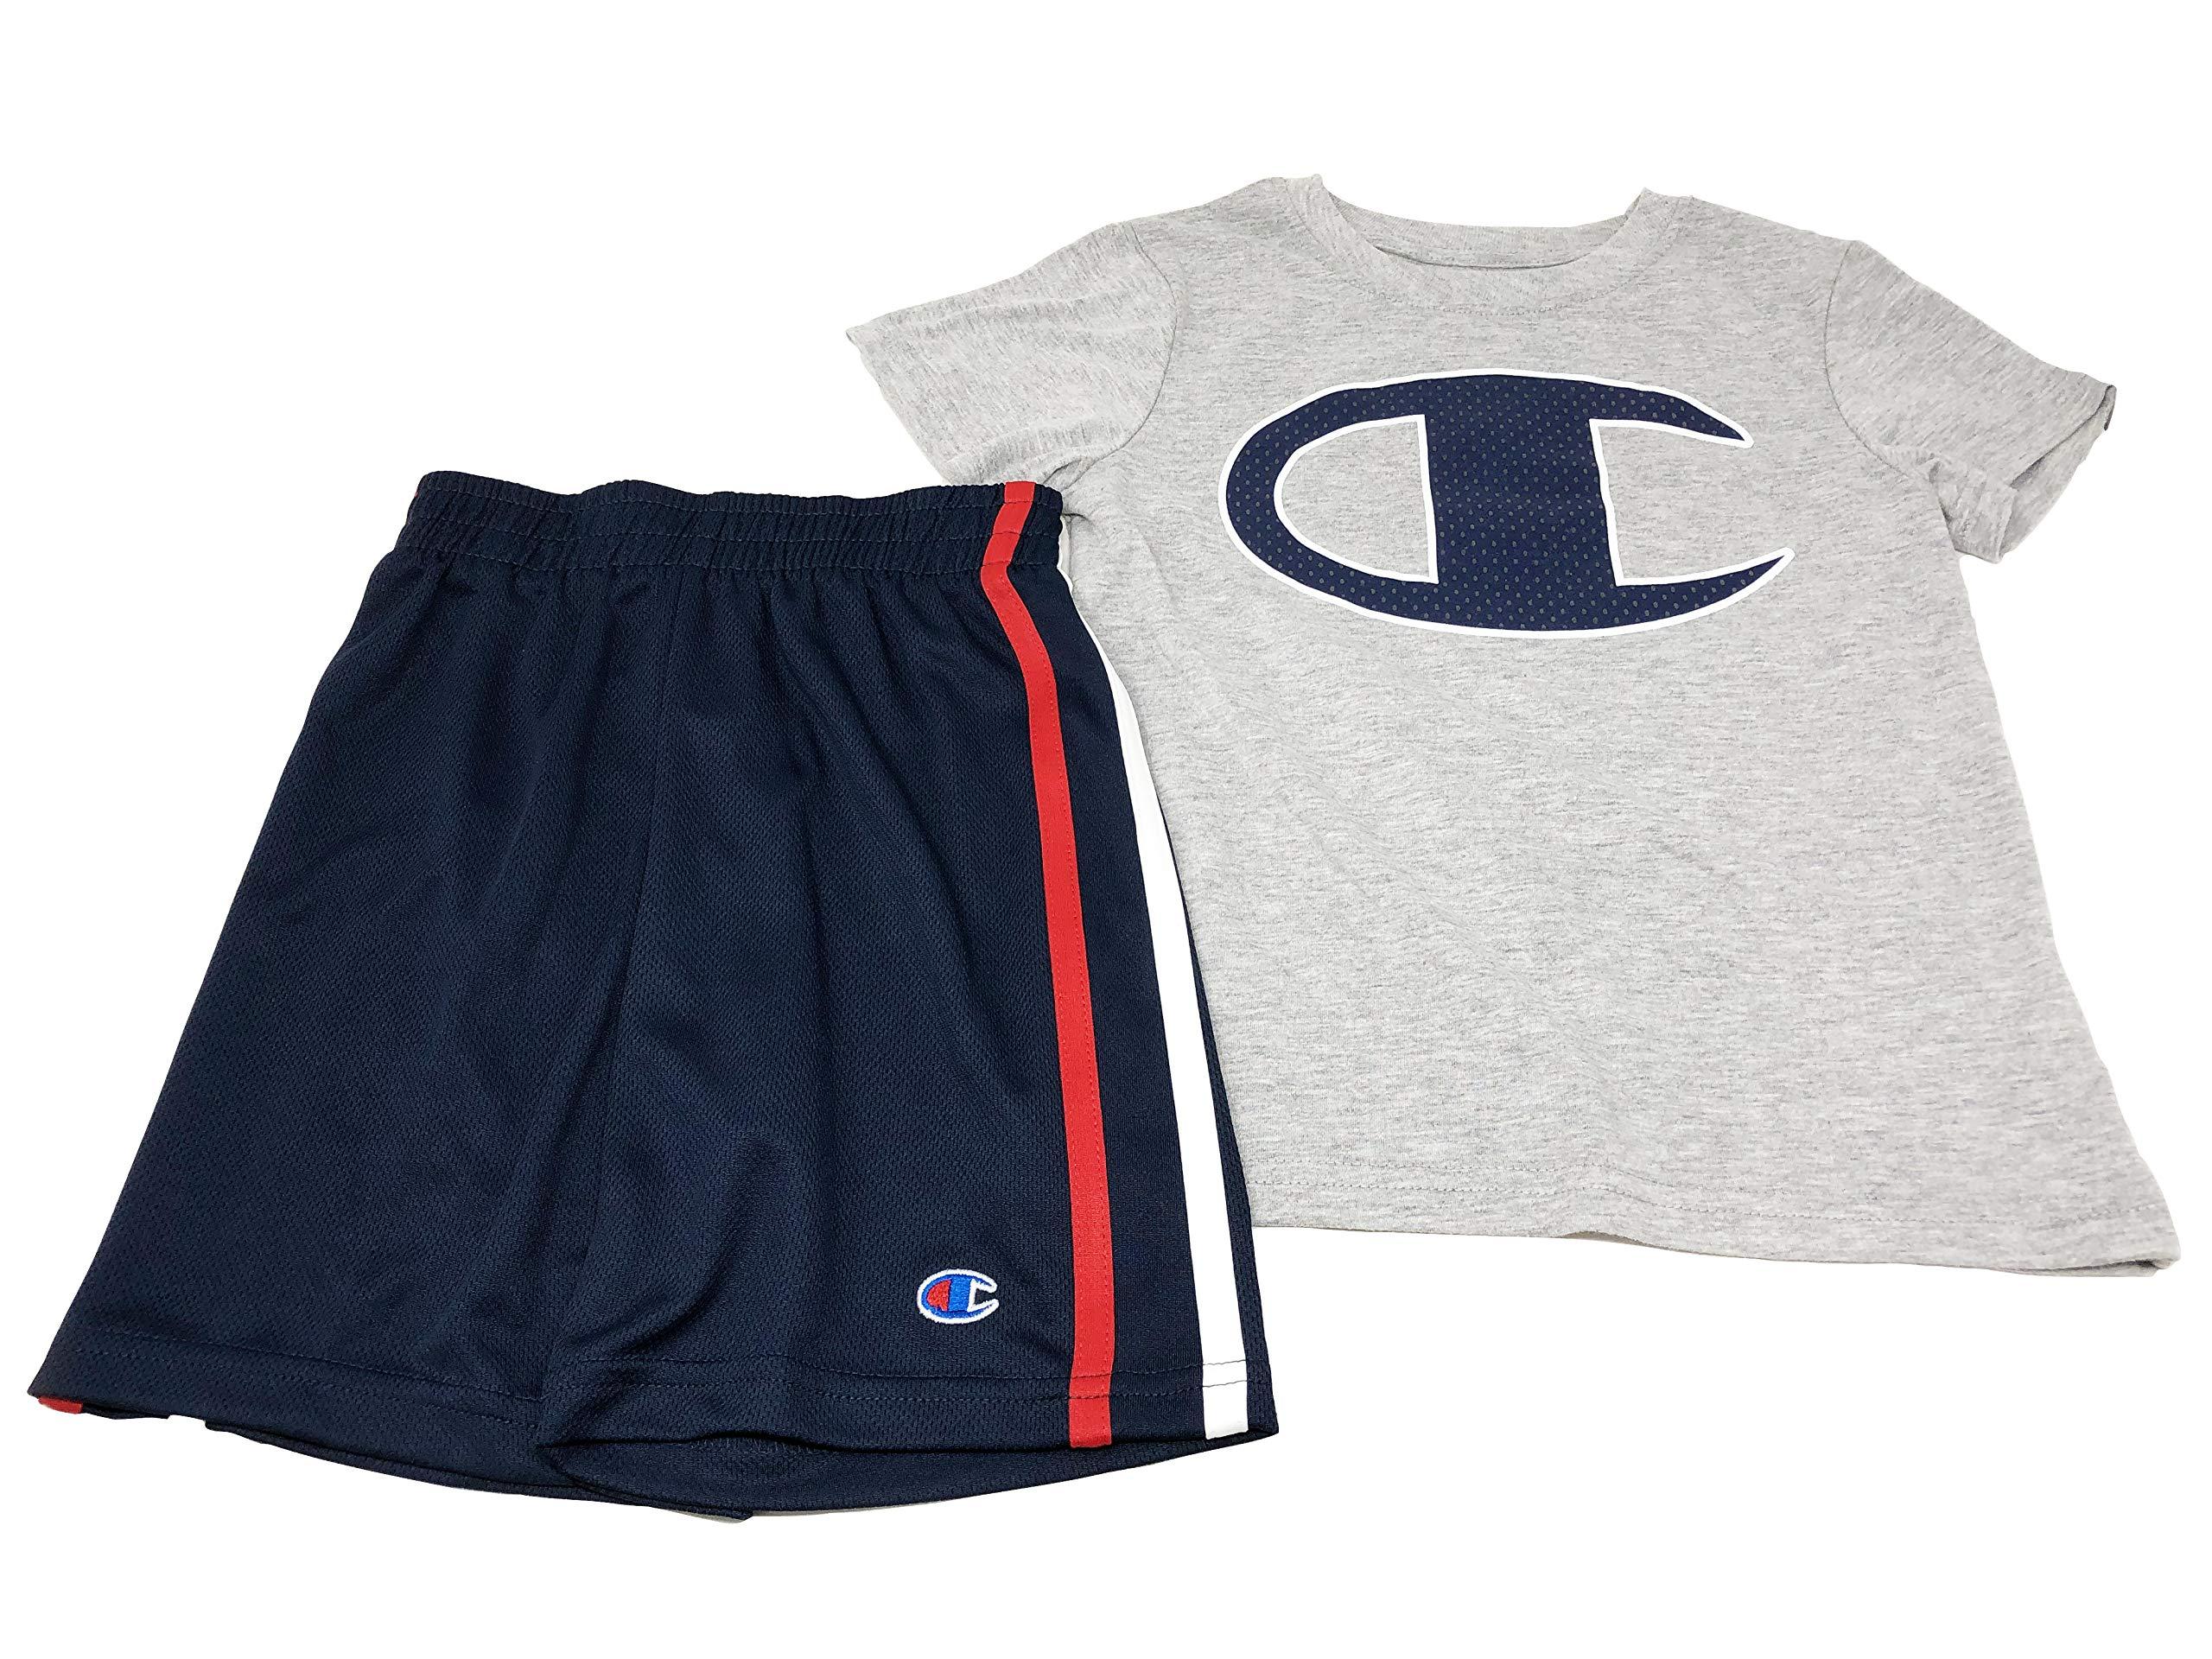 Champion T-Shirt and Shorts 2-Piece Set, Size 6, Gray/Navy